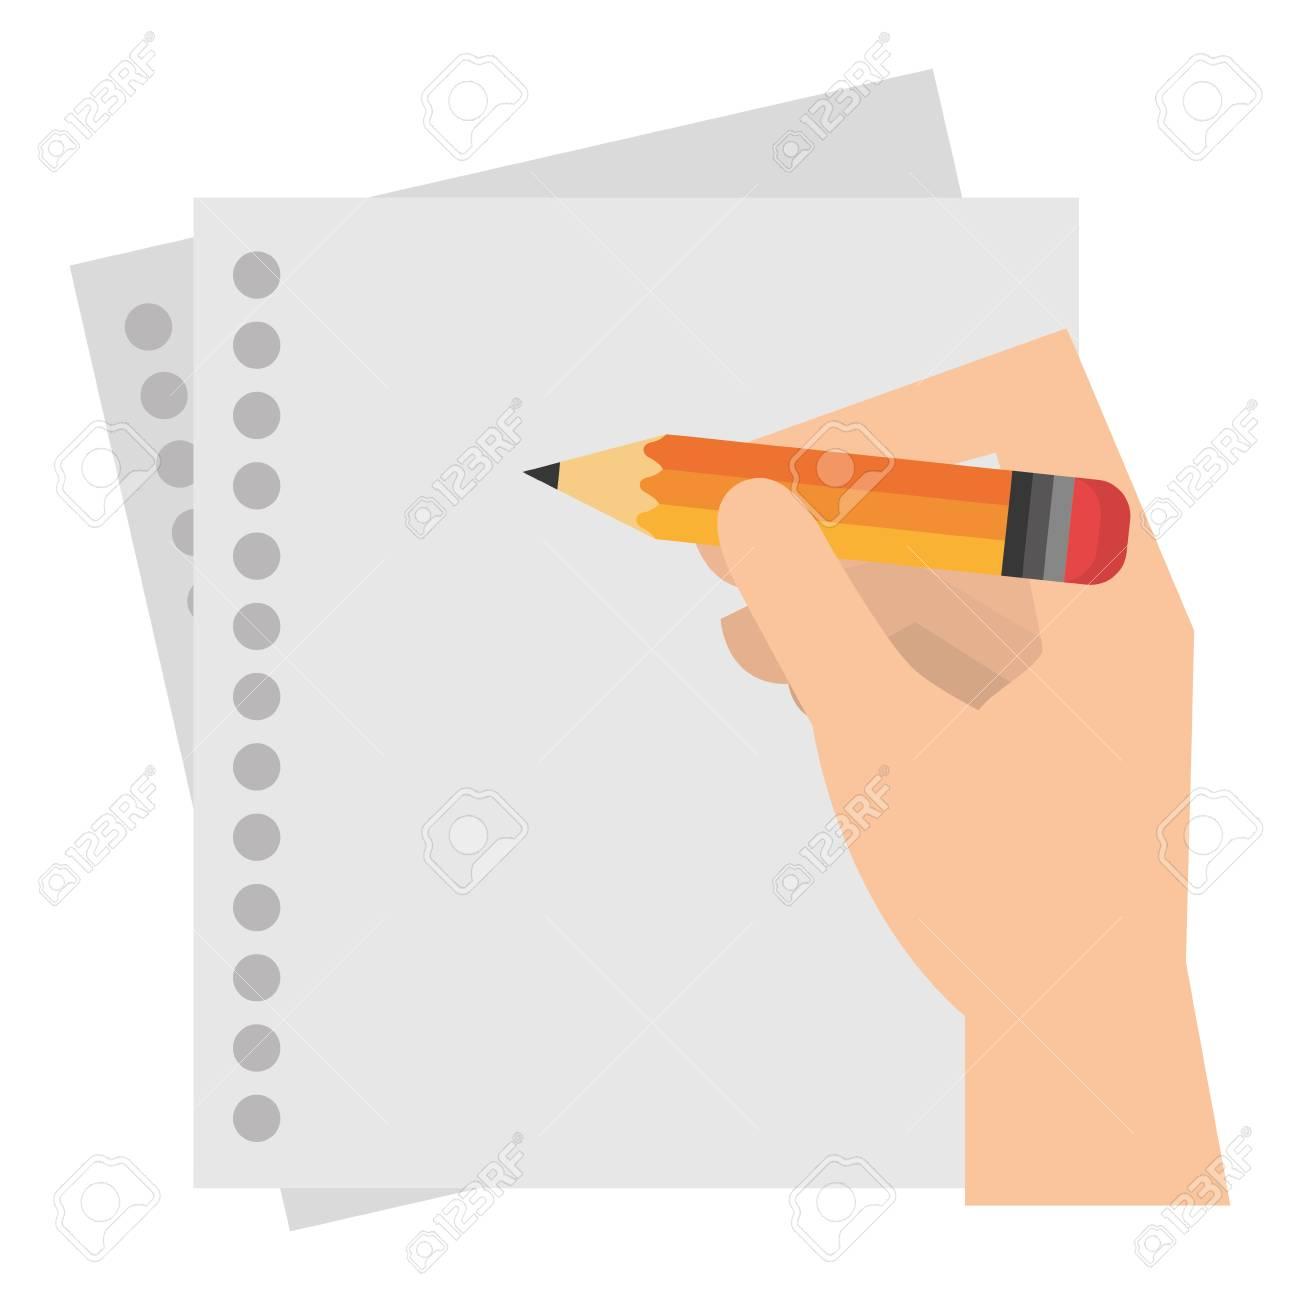 hand writing in notebook sheet vector illustration design - 105561620